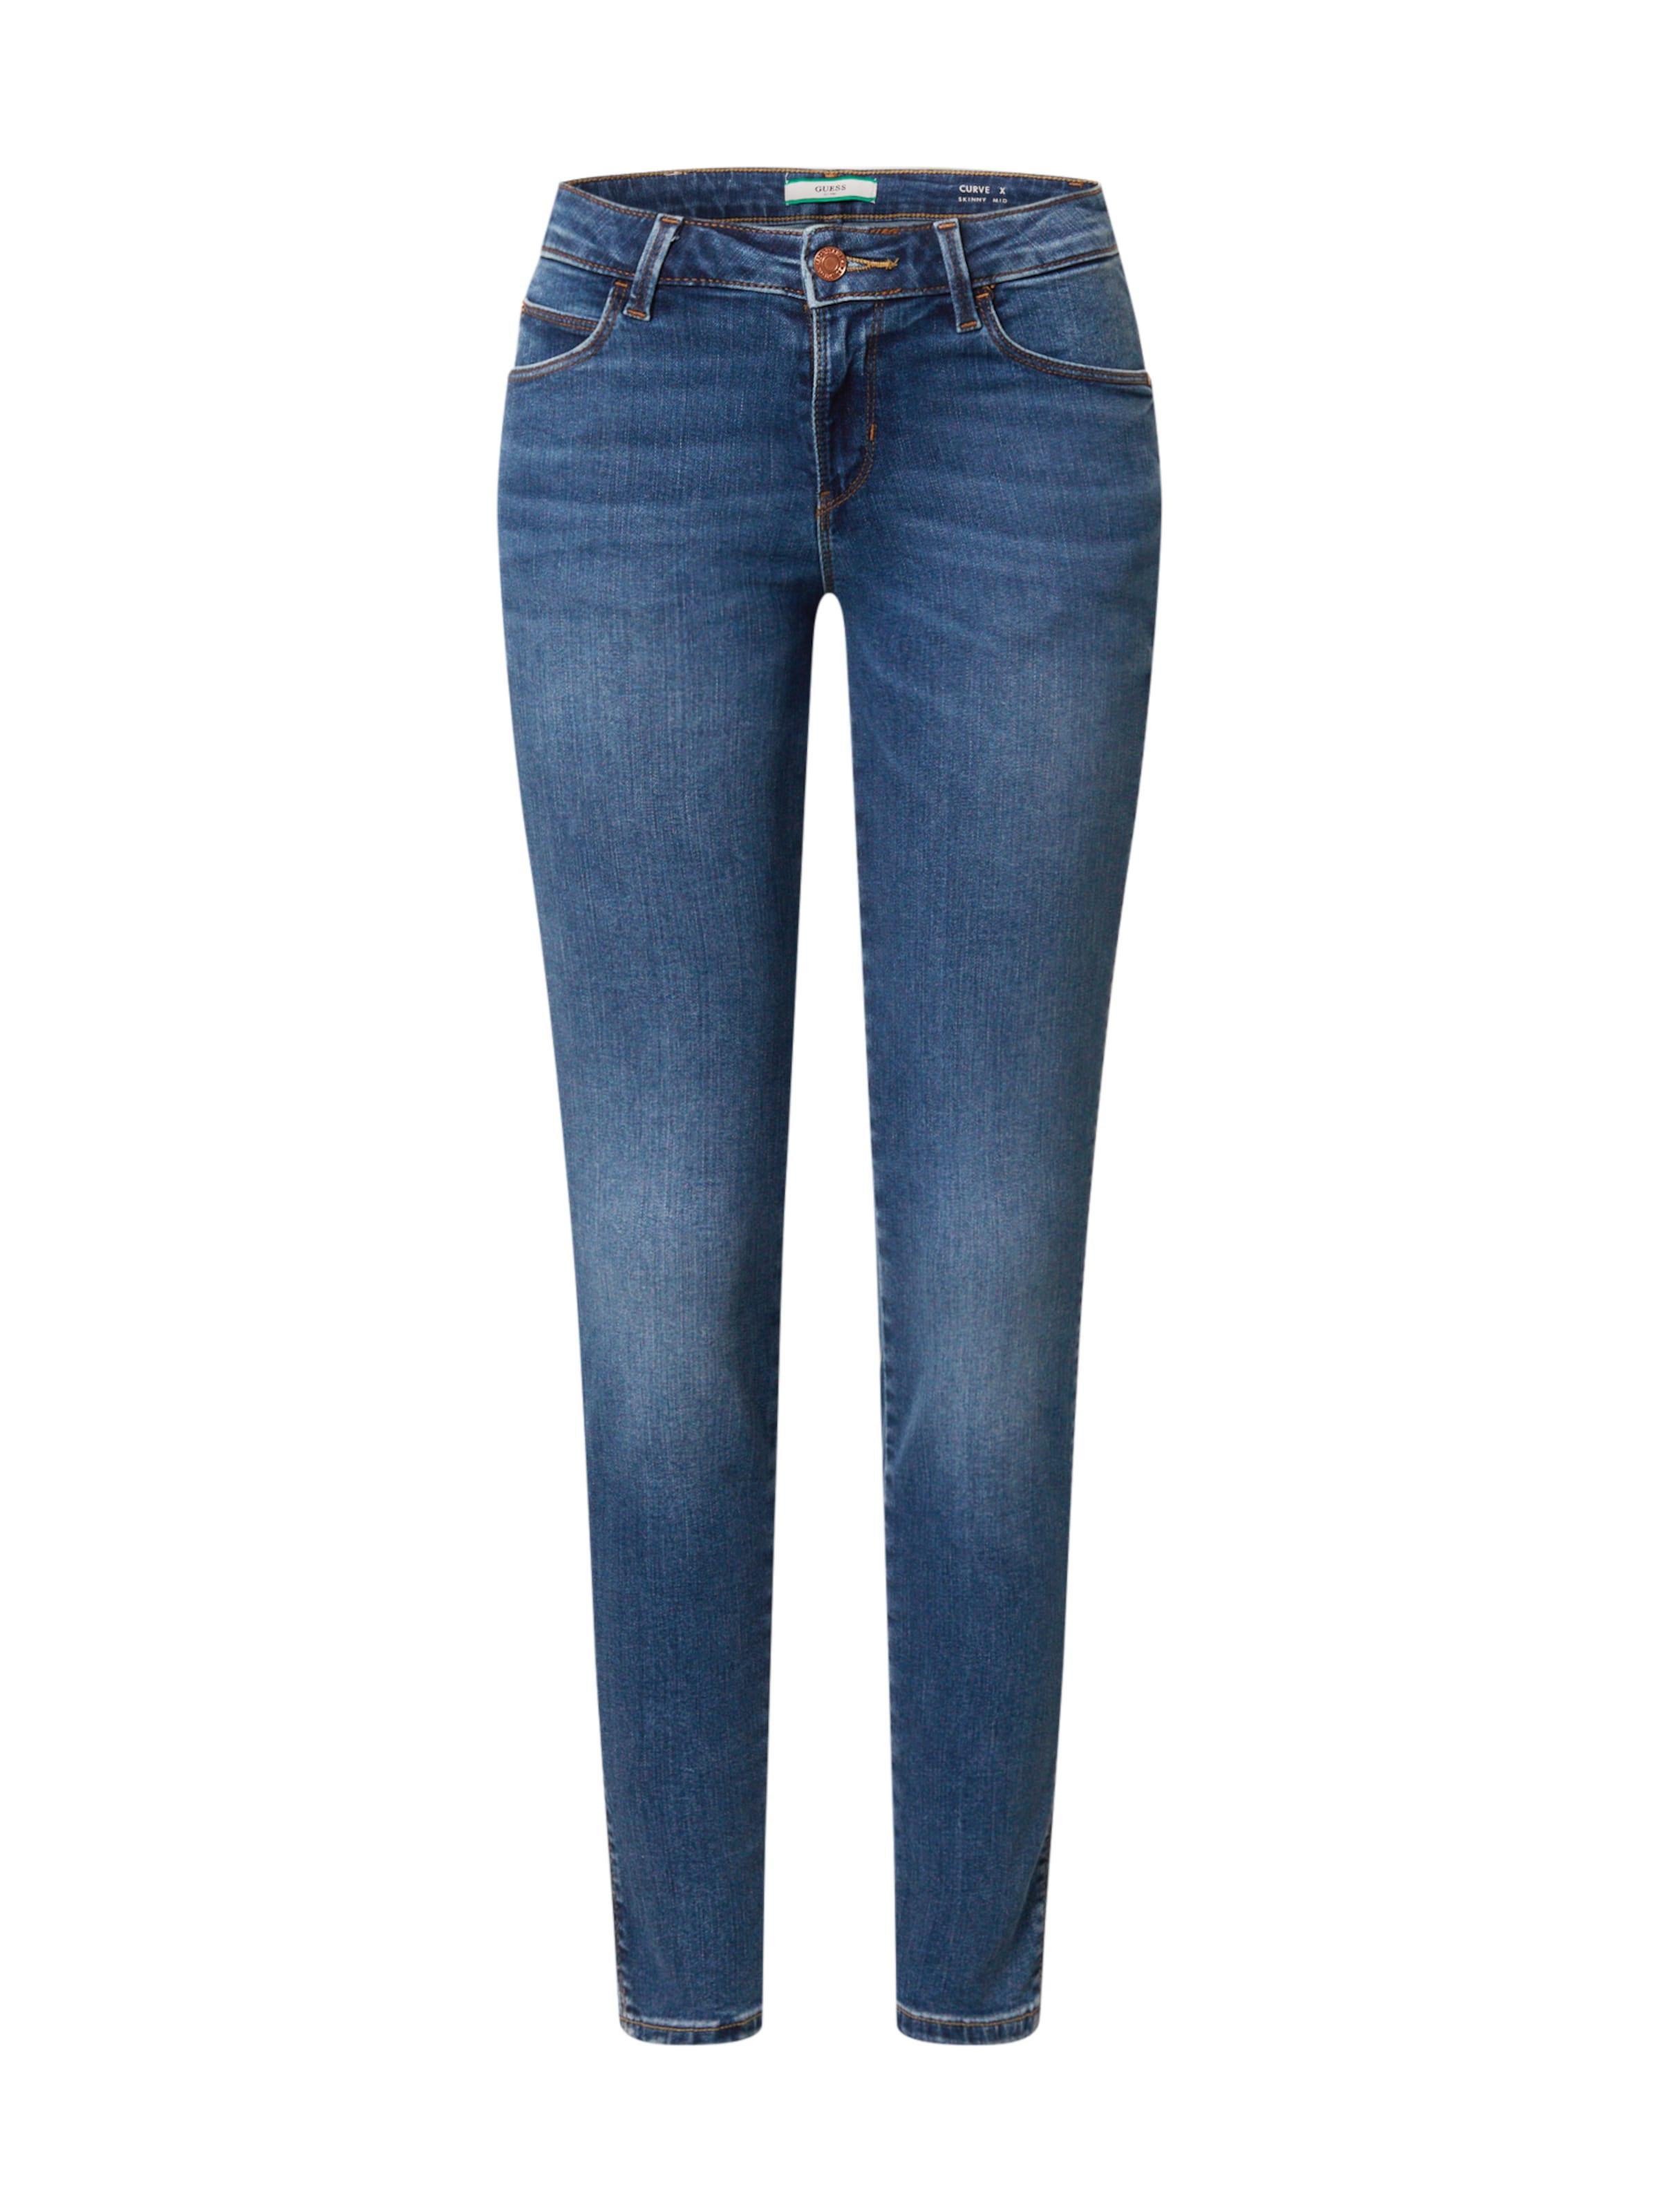 GUESS Jeans 'Curve X' i blå denim